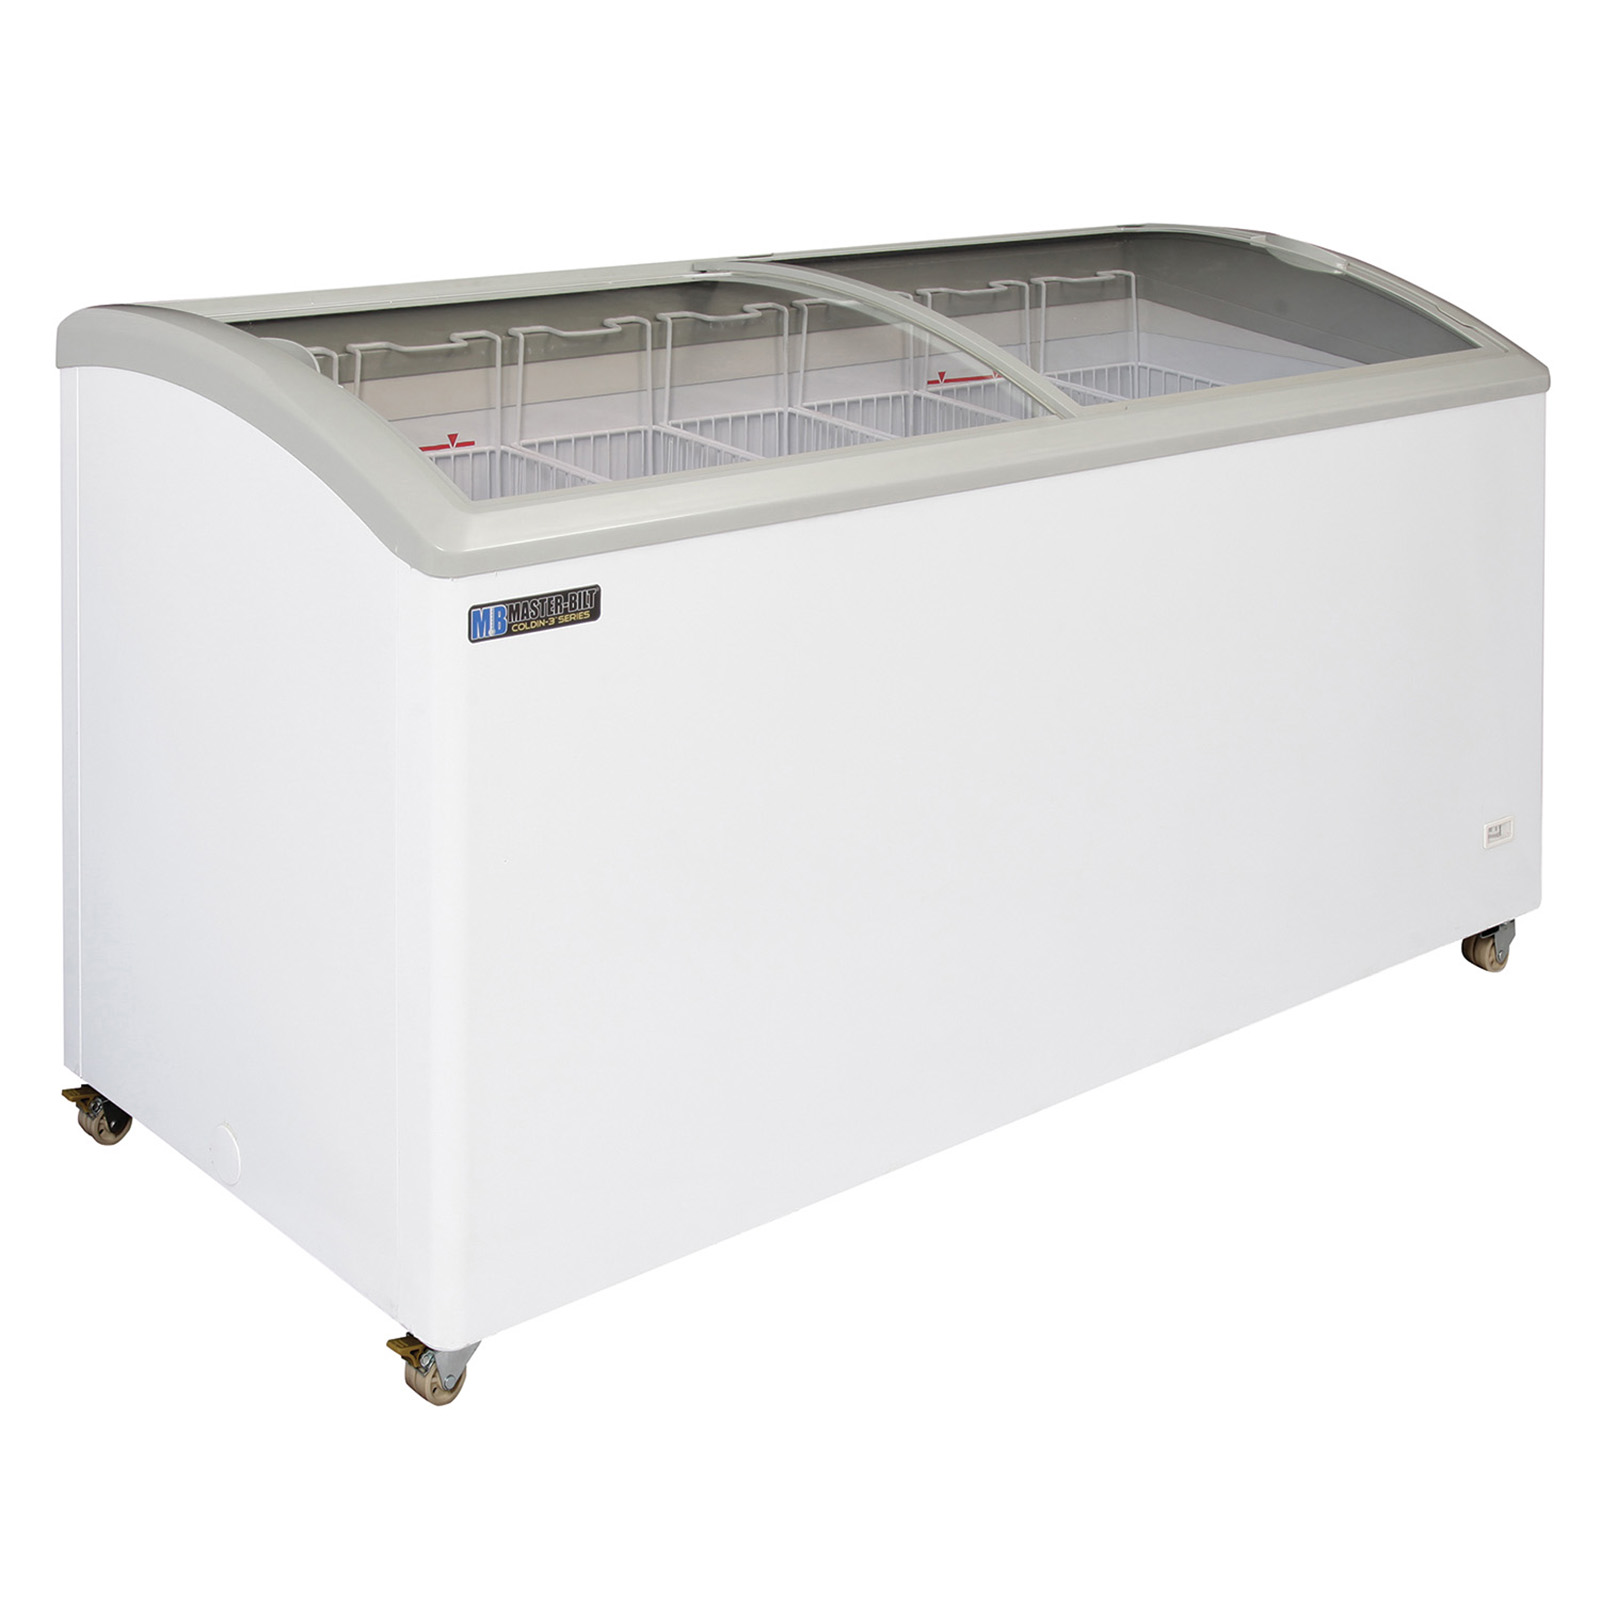 Master-Bilt Products MSC-66AN chest freezer